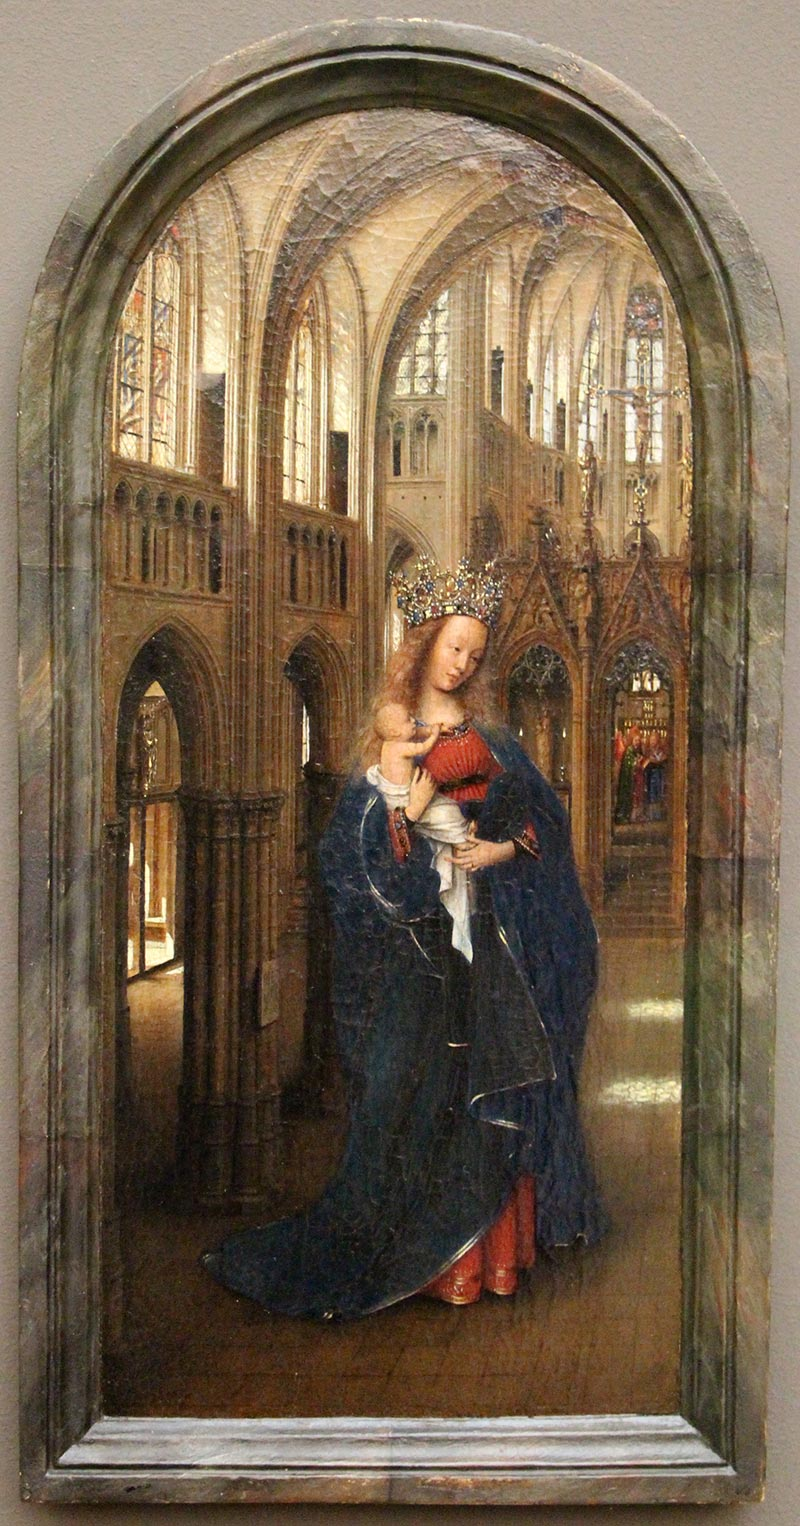 madonna in chiesa alla Gemaldegalerie